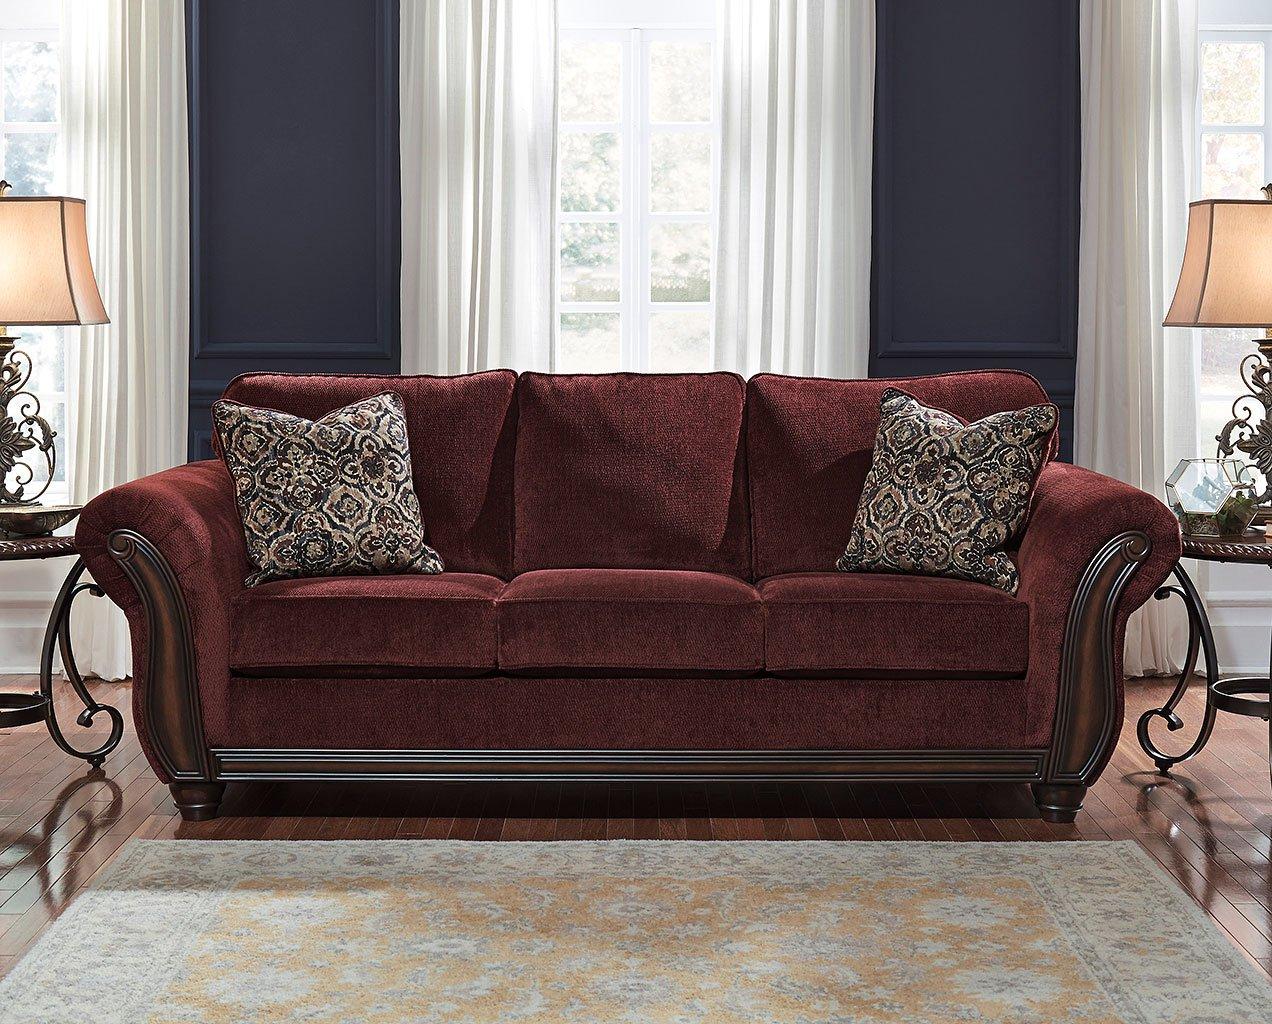 Charmant Chesterbrook Burgundy Sofa